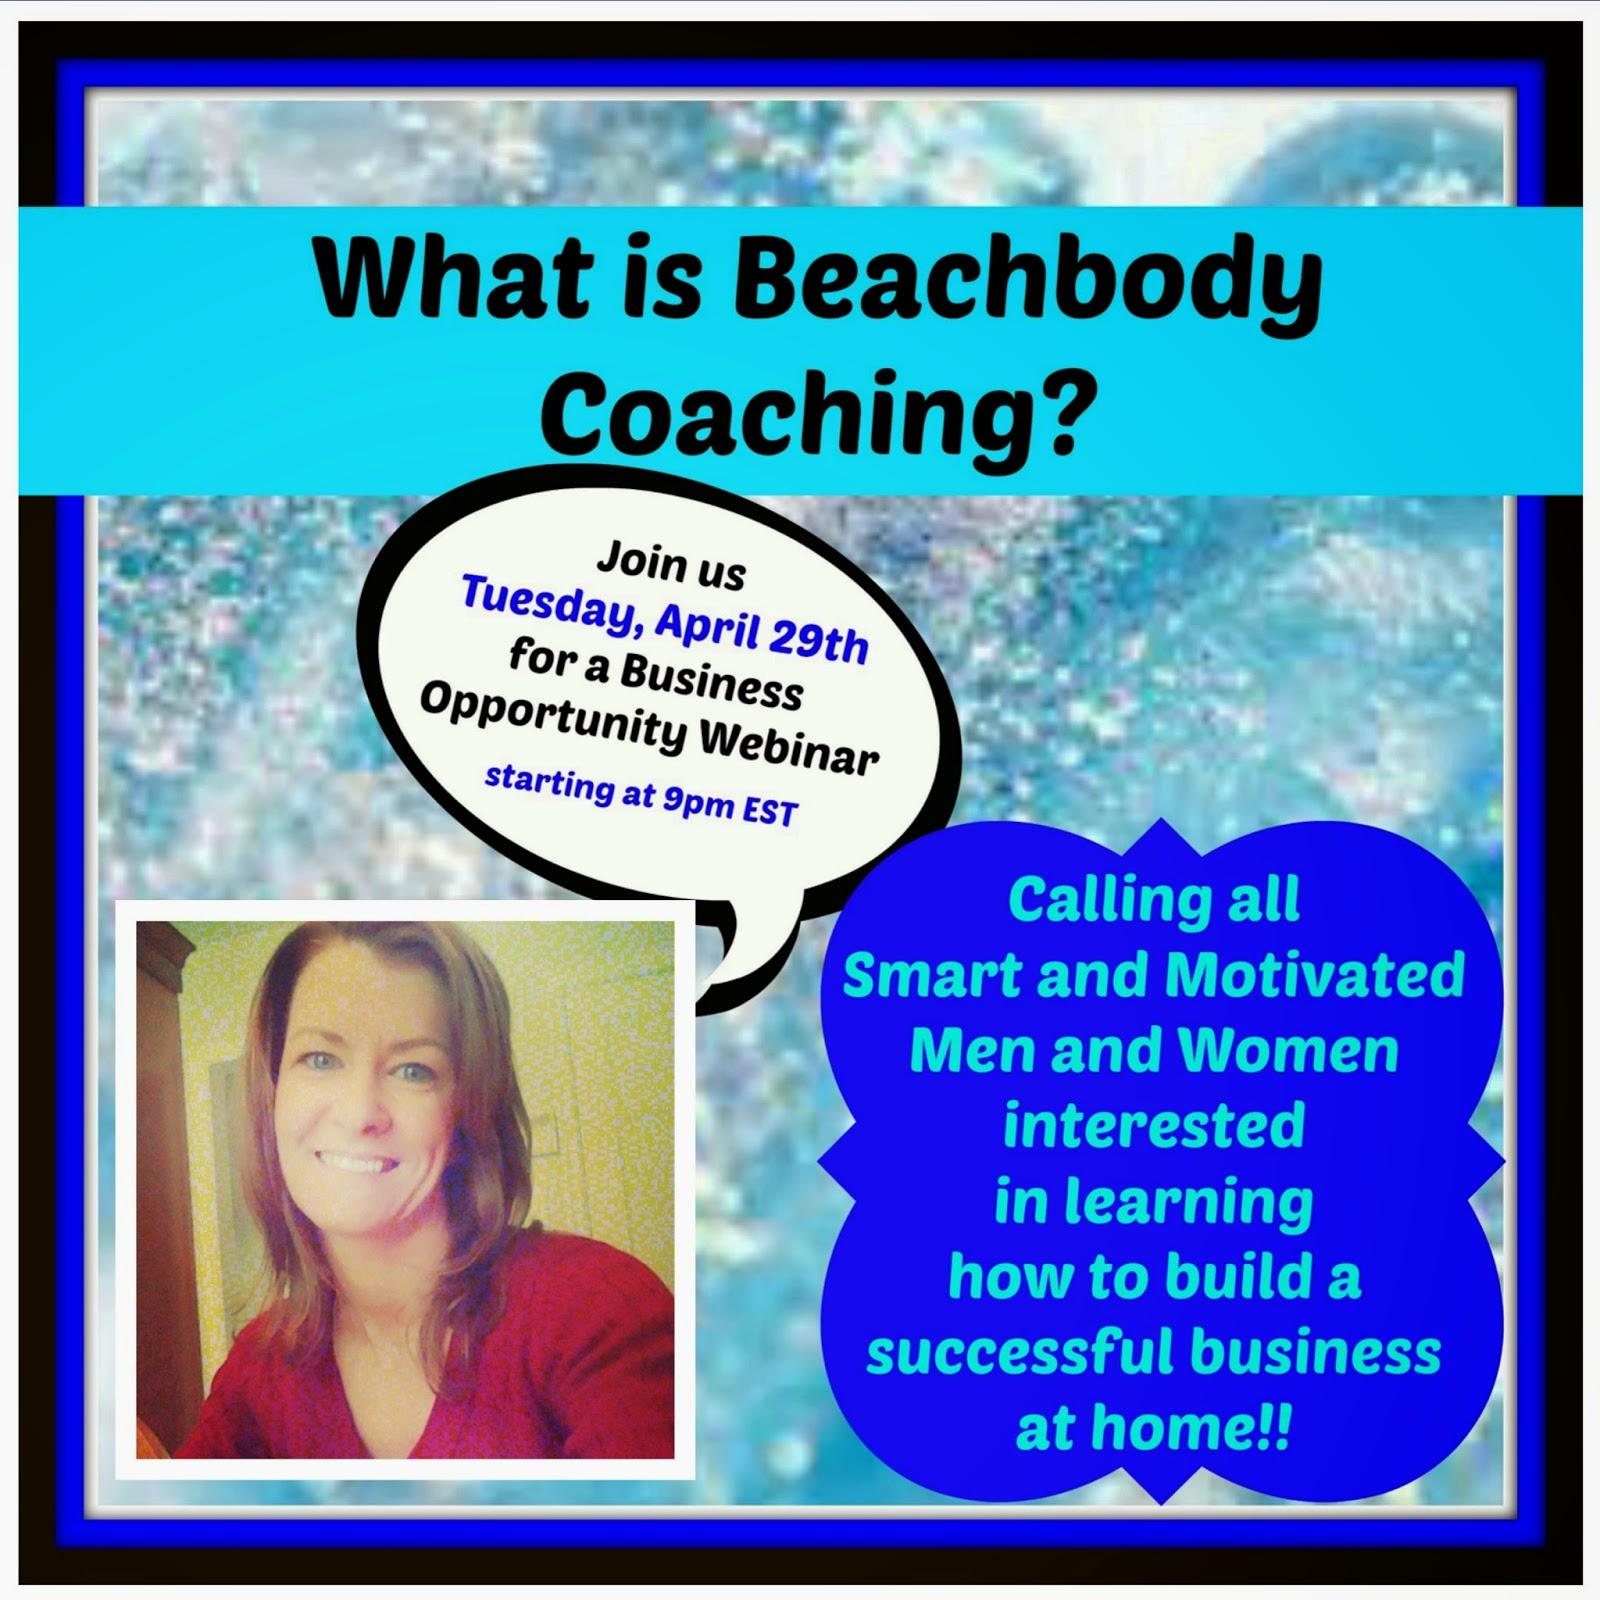 beachbody coaching opportunity, what is a beachbody coach, how to make money as a beachbody coach, beachbody coach success story